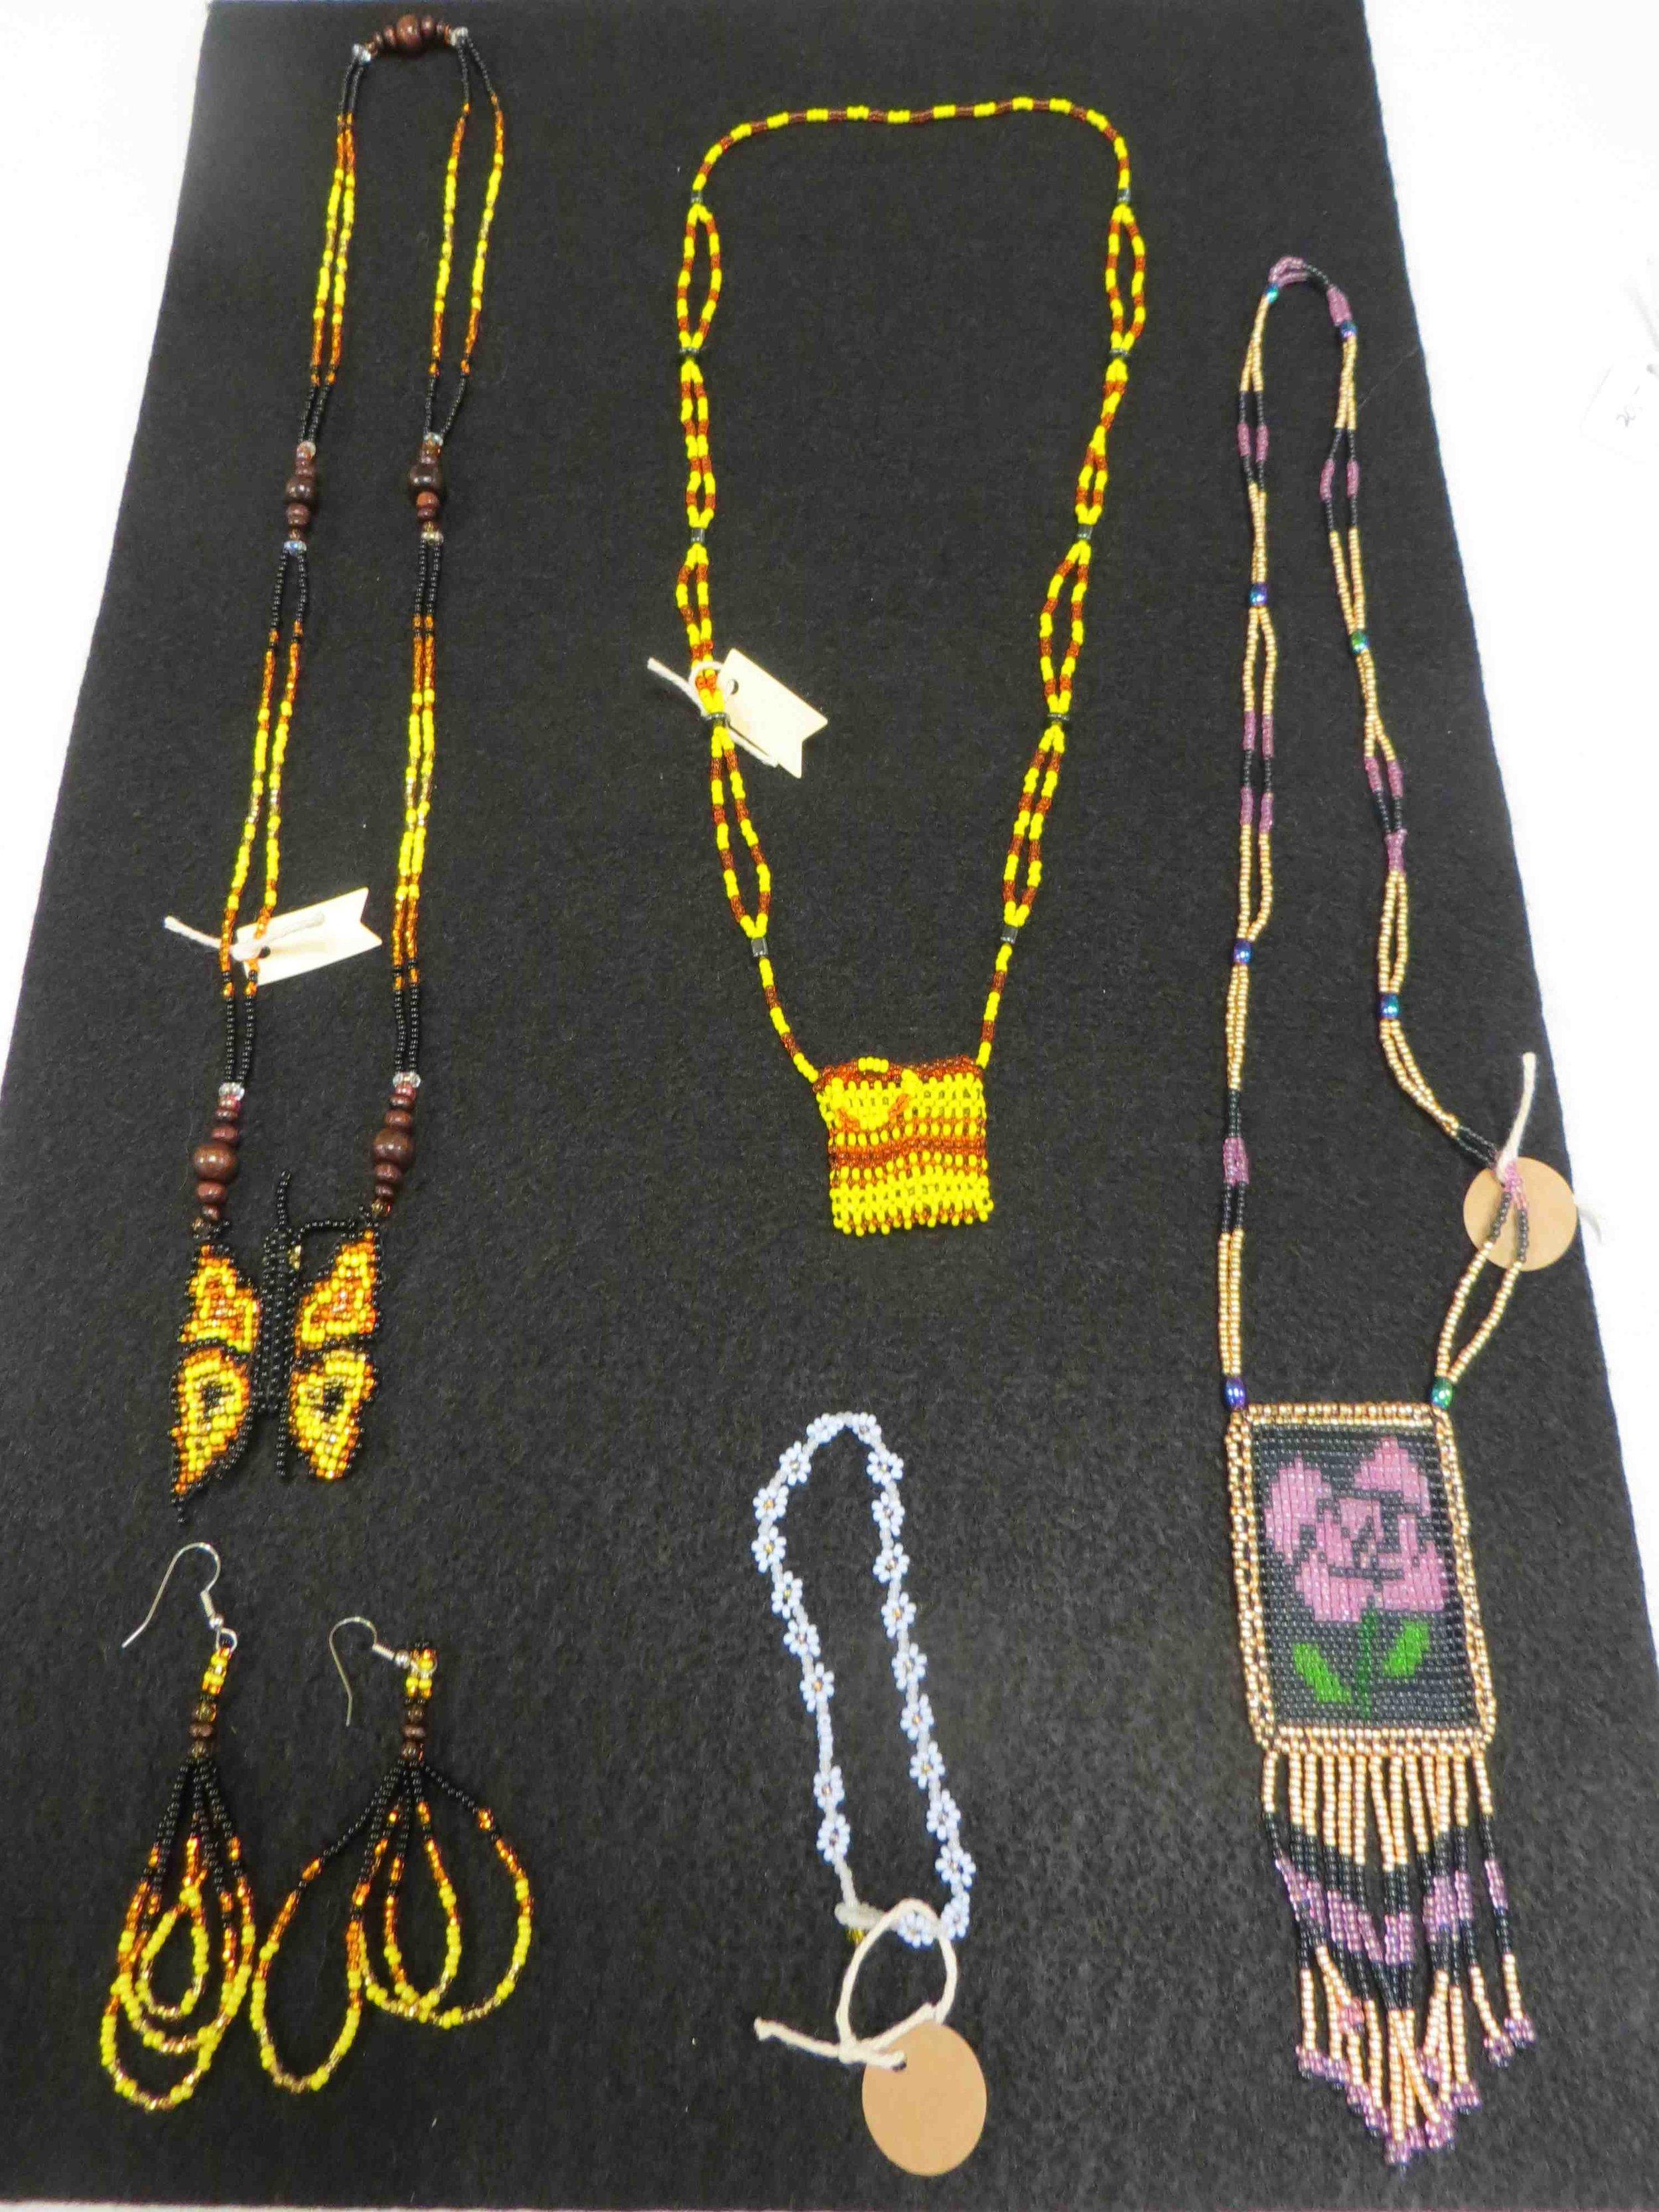 PATH Fundraiser Beaded Jewelry b-011 - Copy.jpg